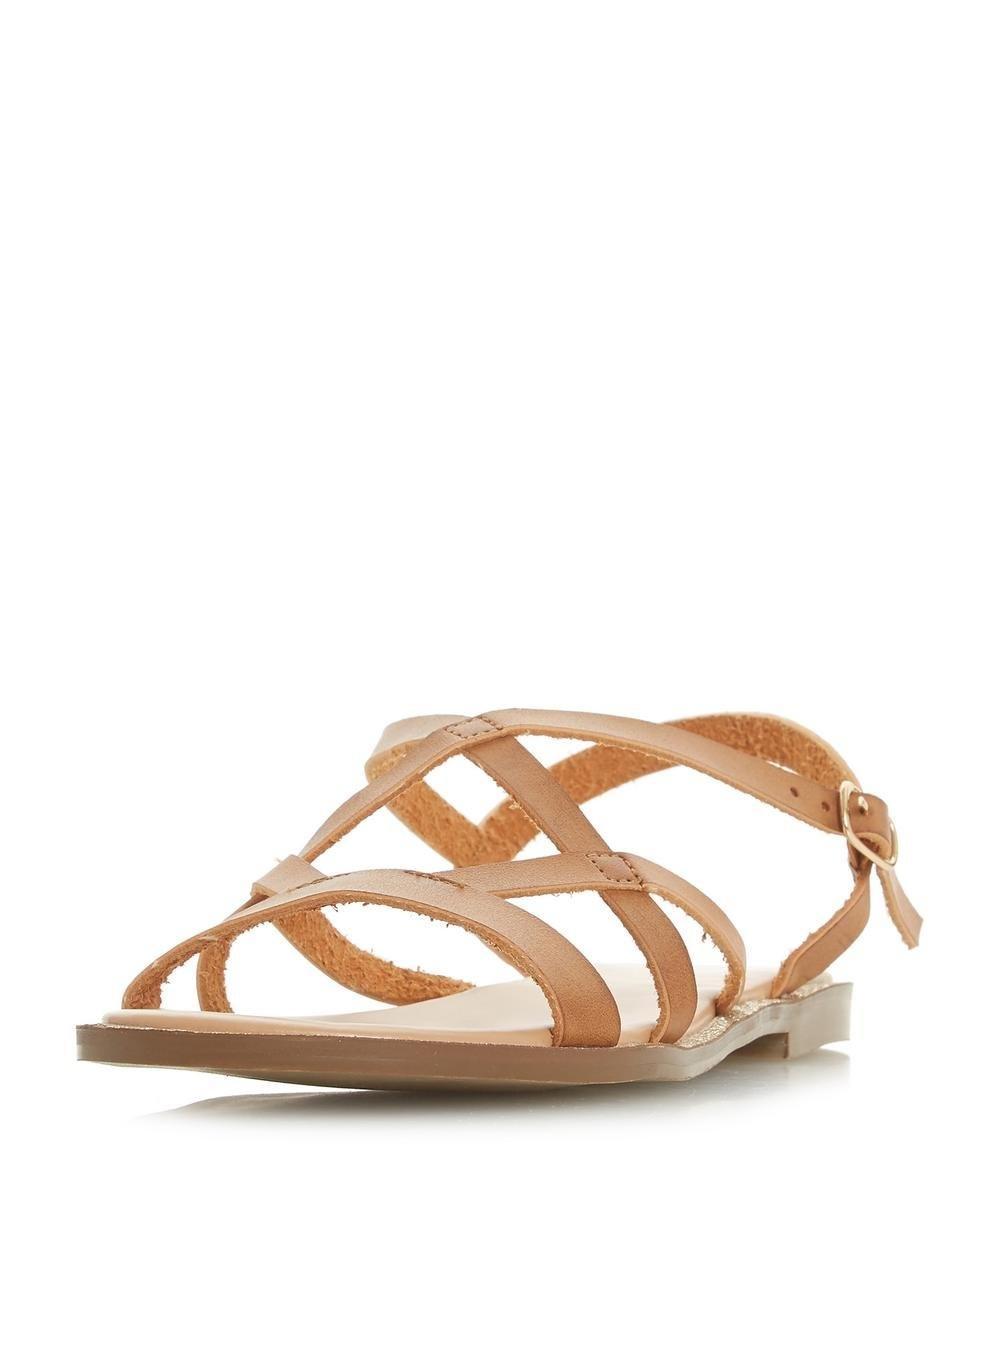 d7e730615 Dorothy Perkins Head Over Heels By Dune Tan  lima  Ladies Flat ...